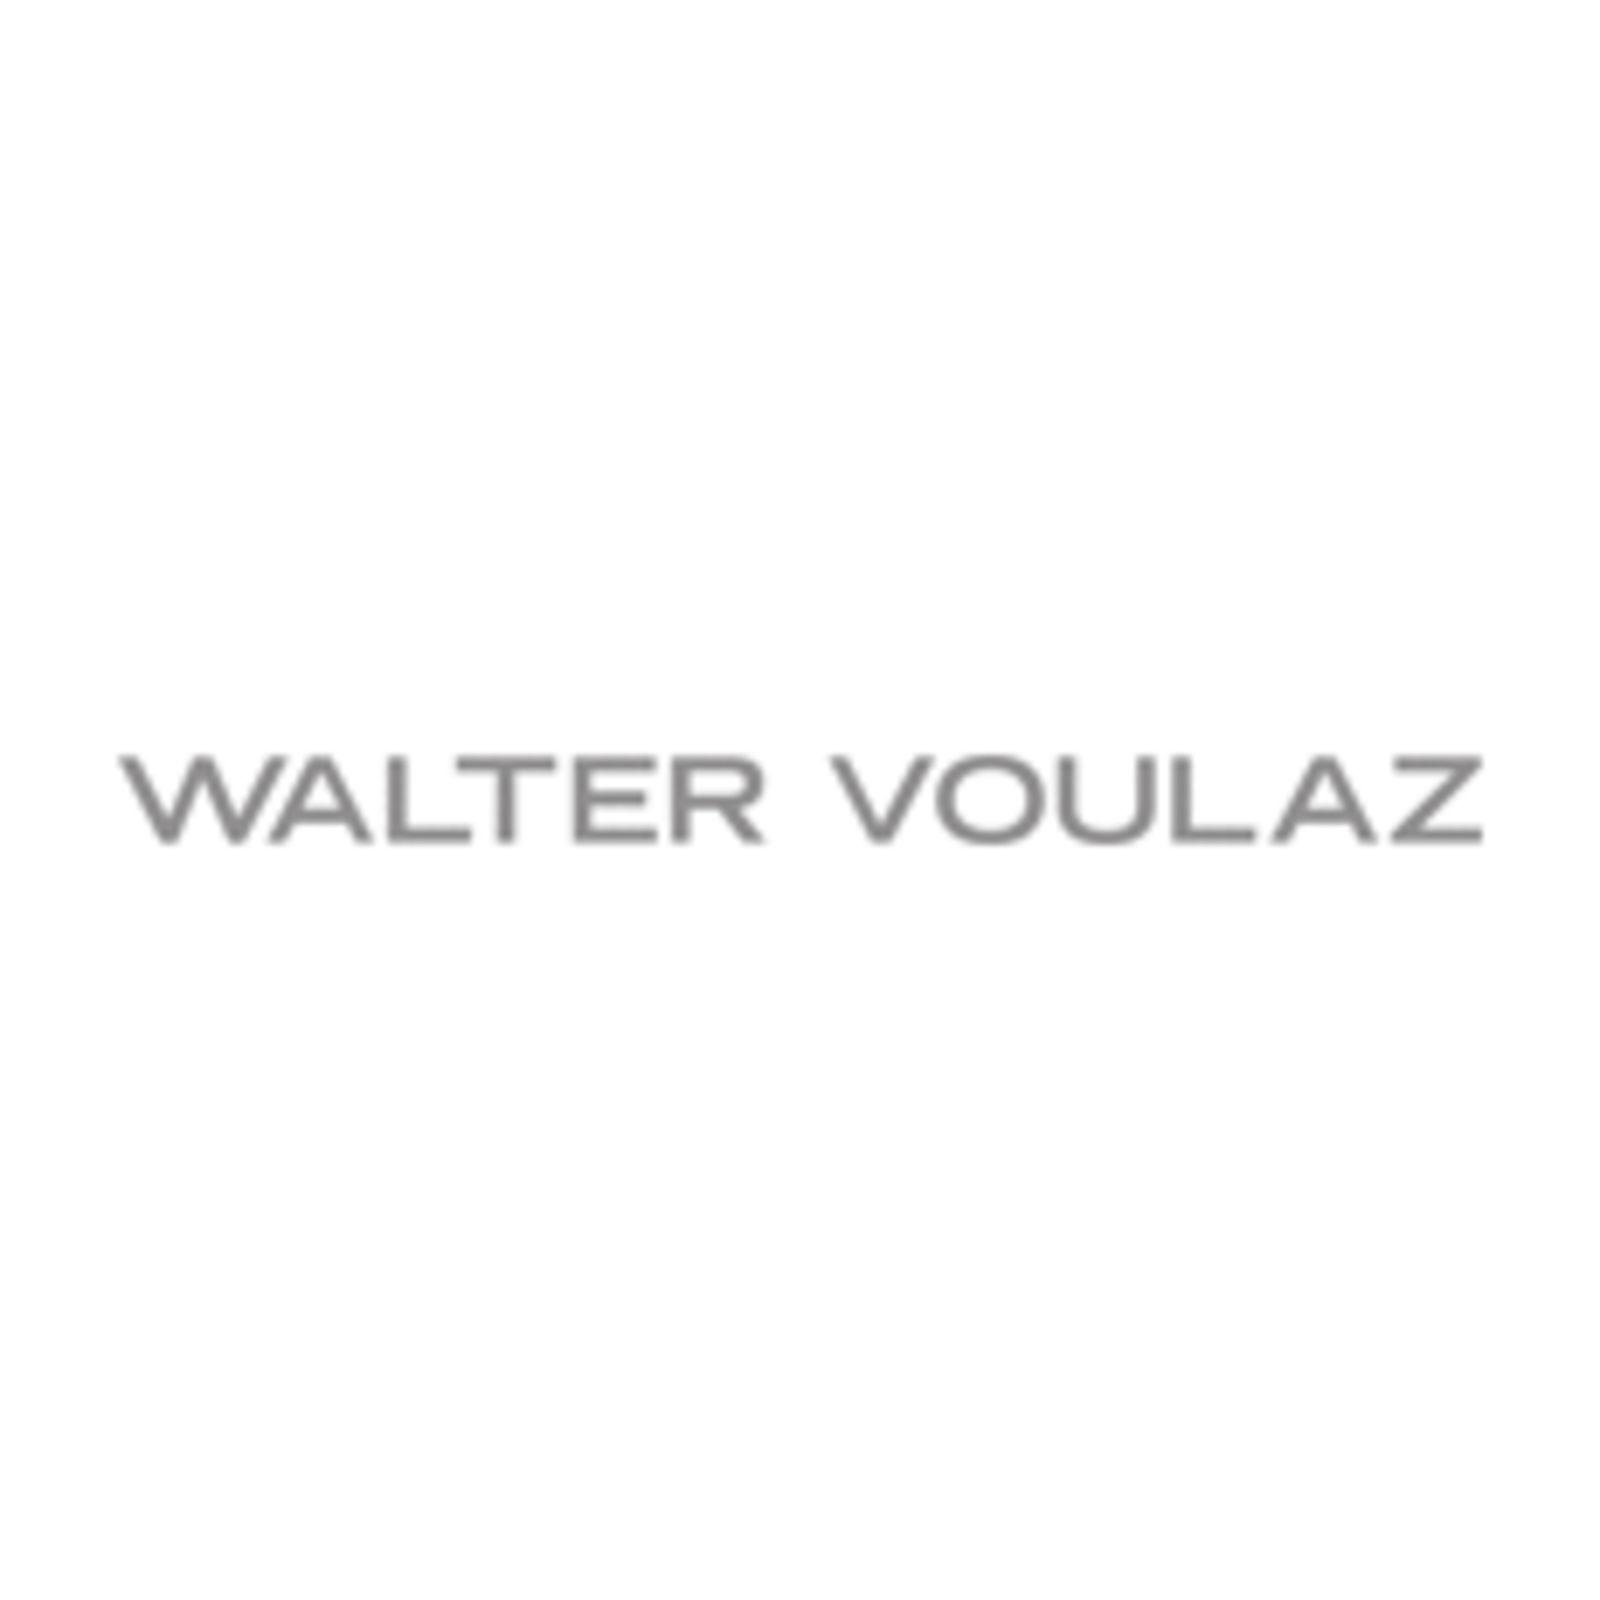 WALTER VOULAZ